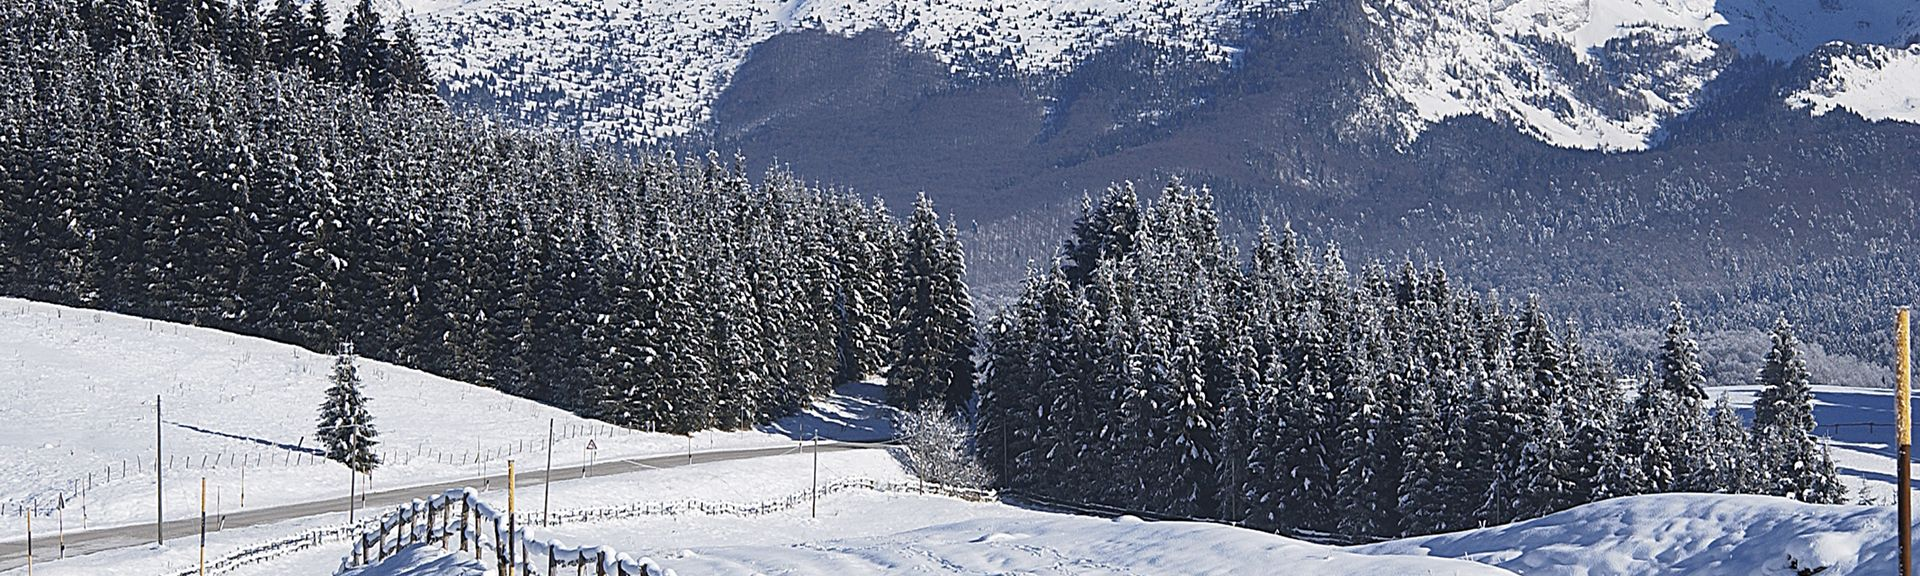 Province of Pordenone, Italy